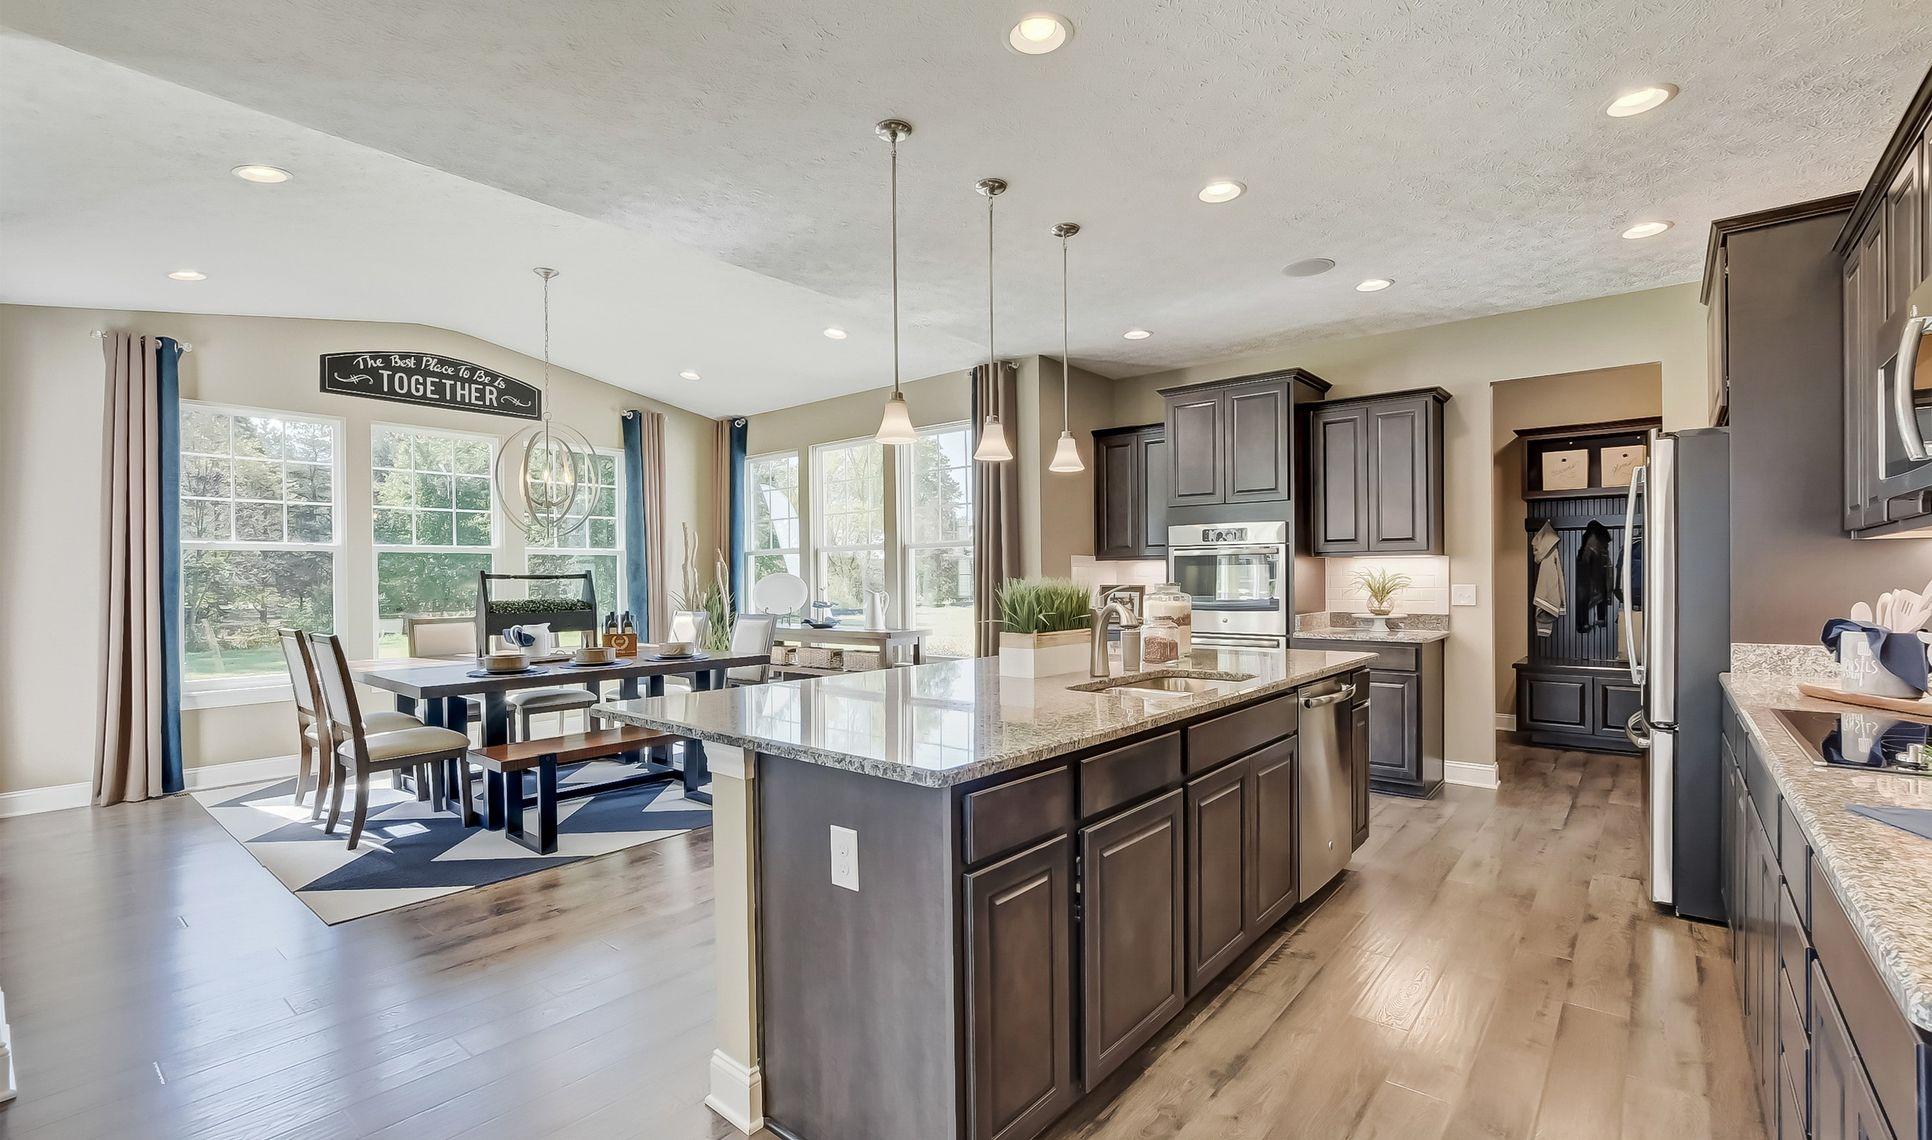 Interior:Kitchen overlooking morning room